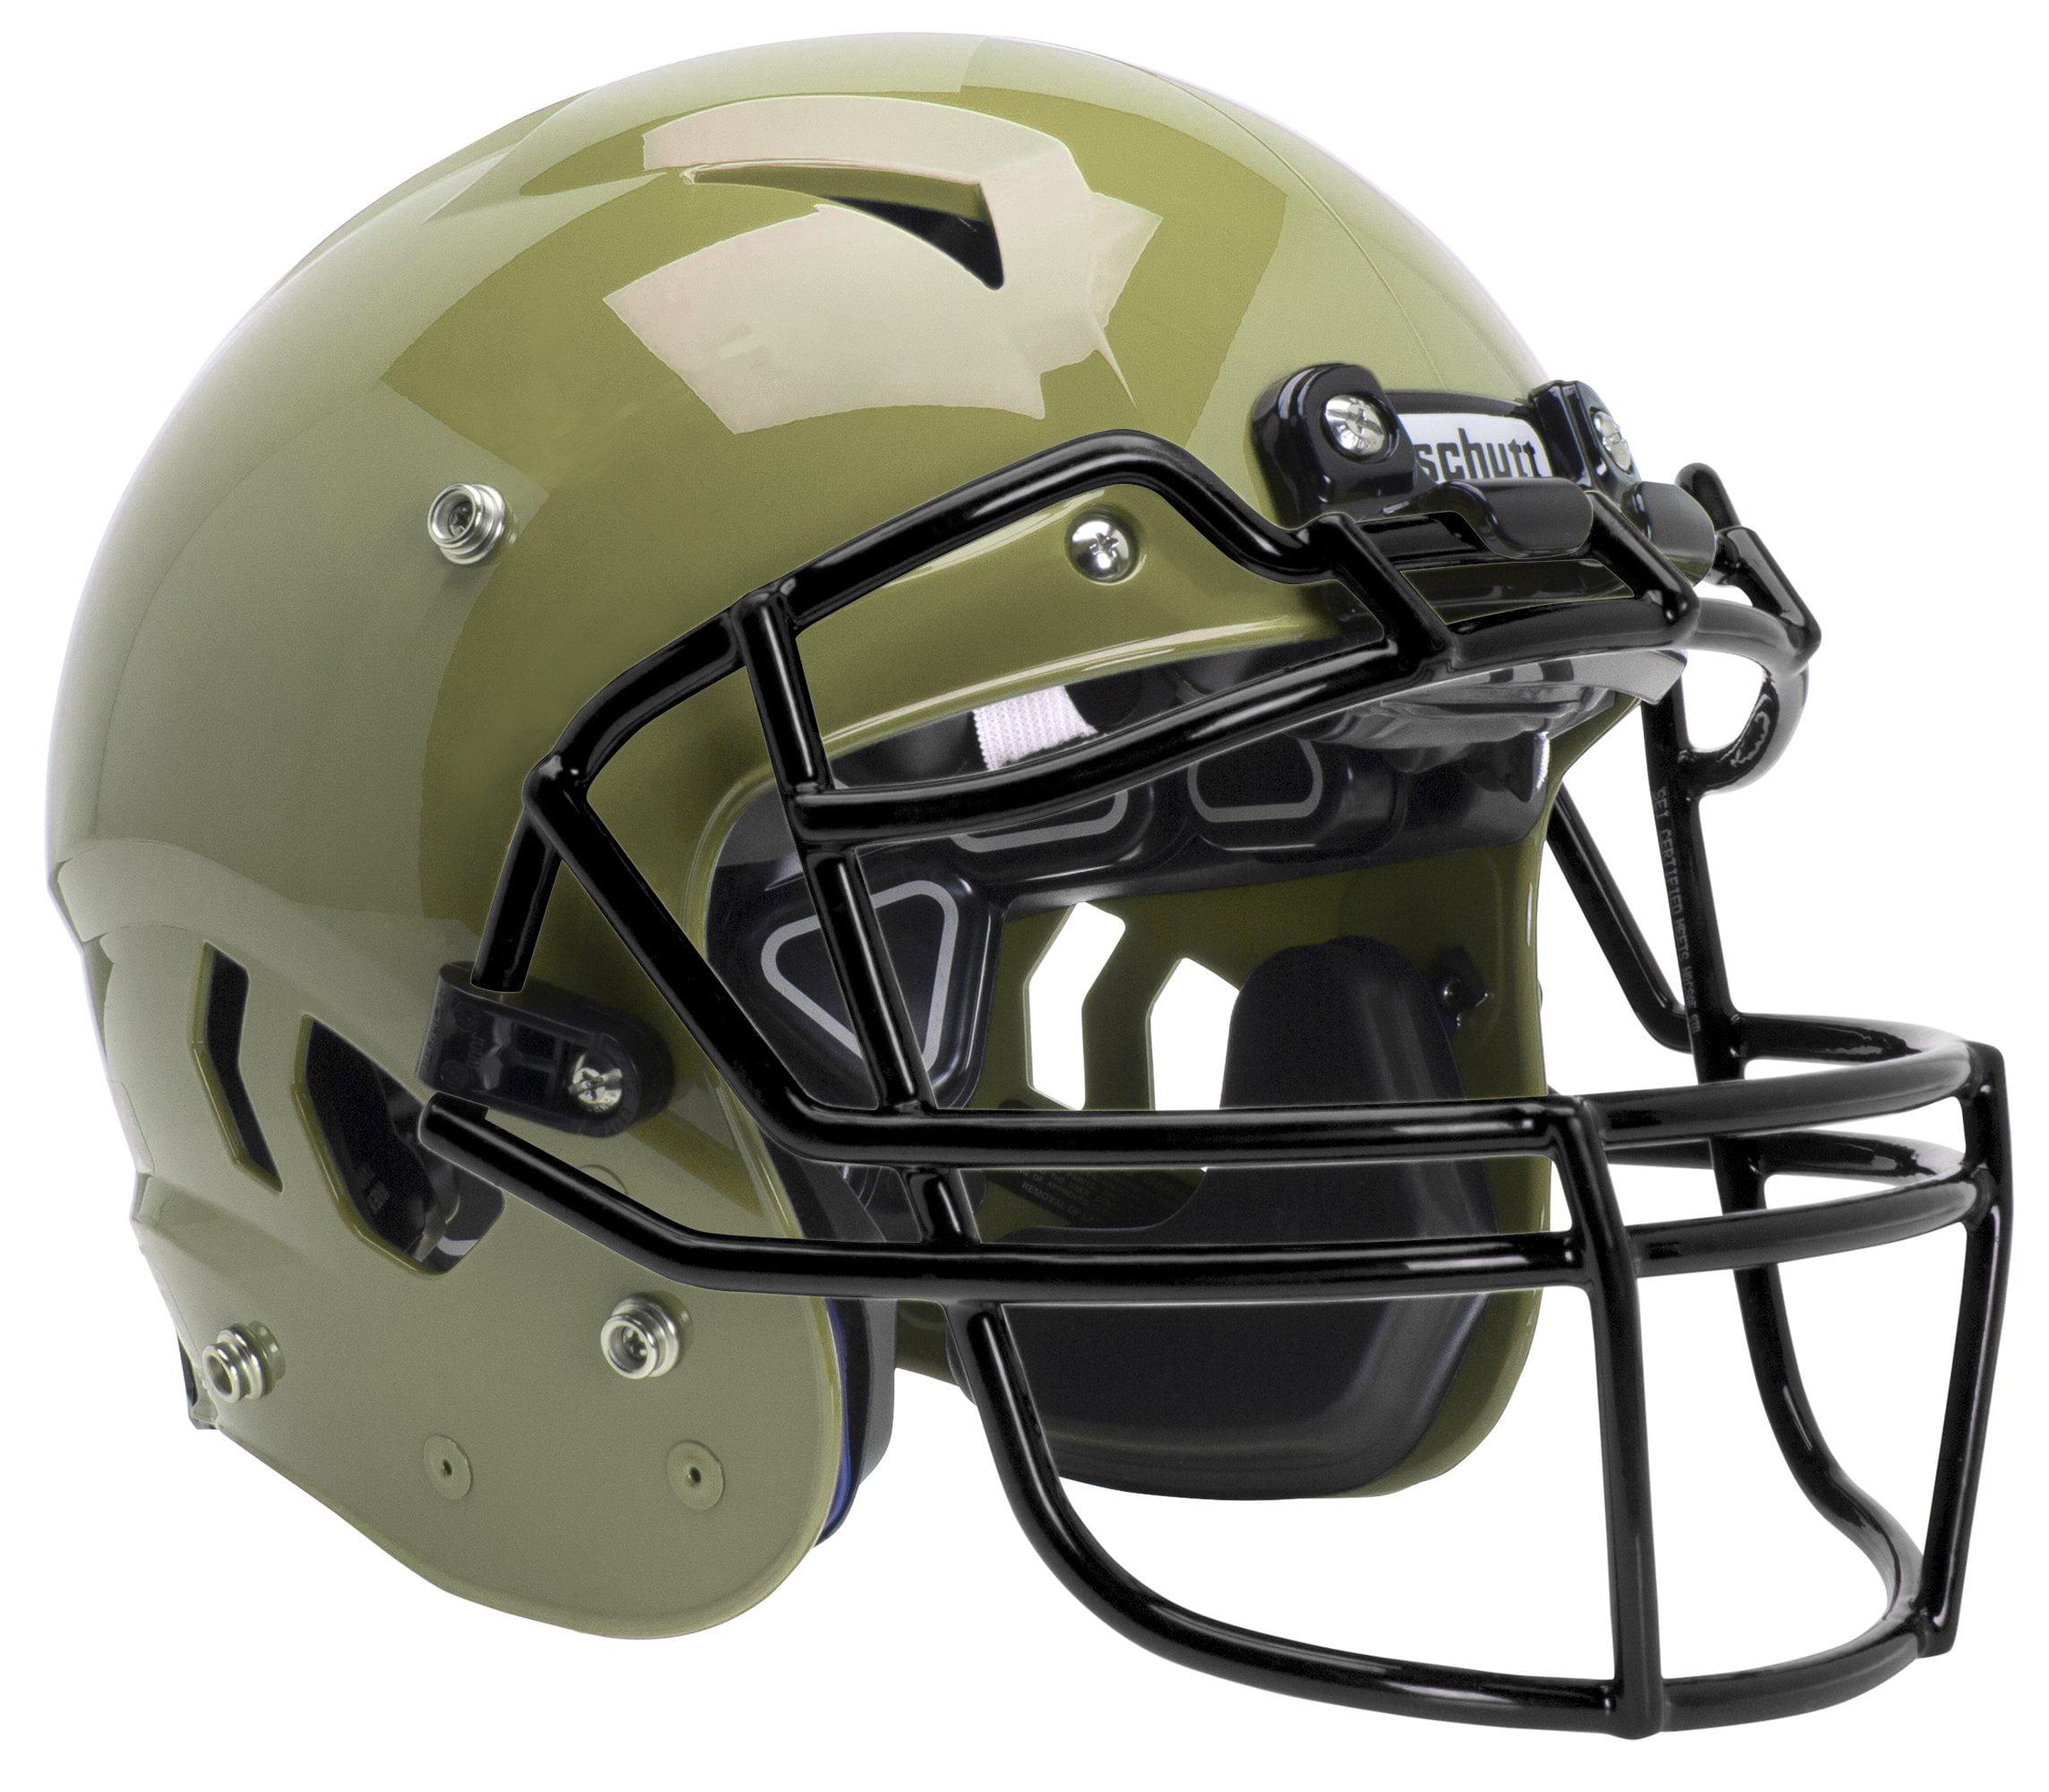 NEW White Schutt Vengeance A11 ROPO-TRAD Youth Football Helmet Lists @ $160